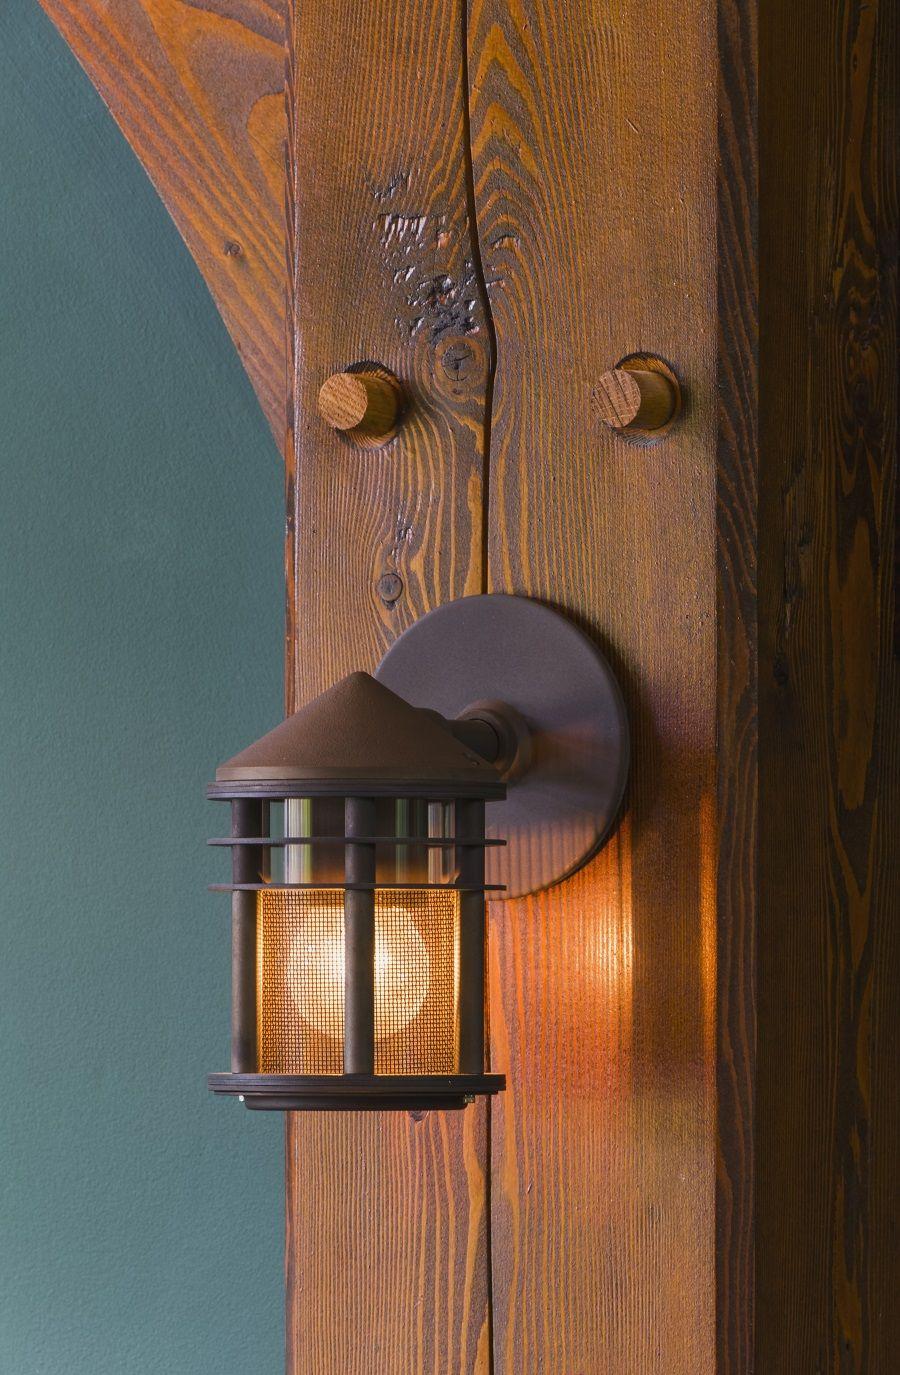 & Pin by B-K Lighting on TEKA Illumination | Pinterest | Products